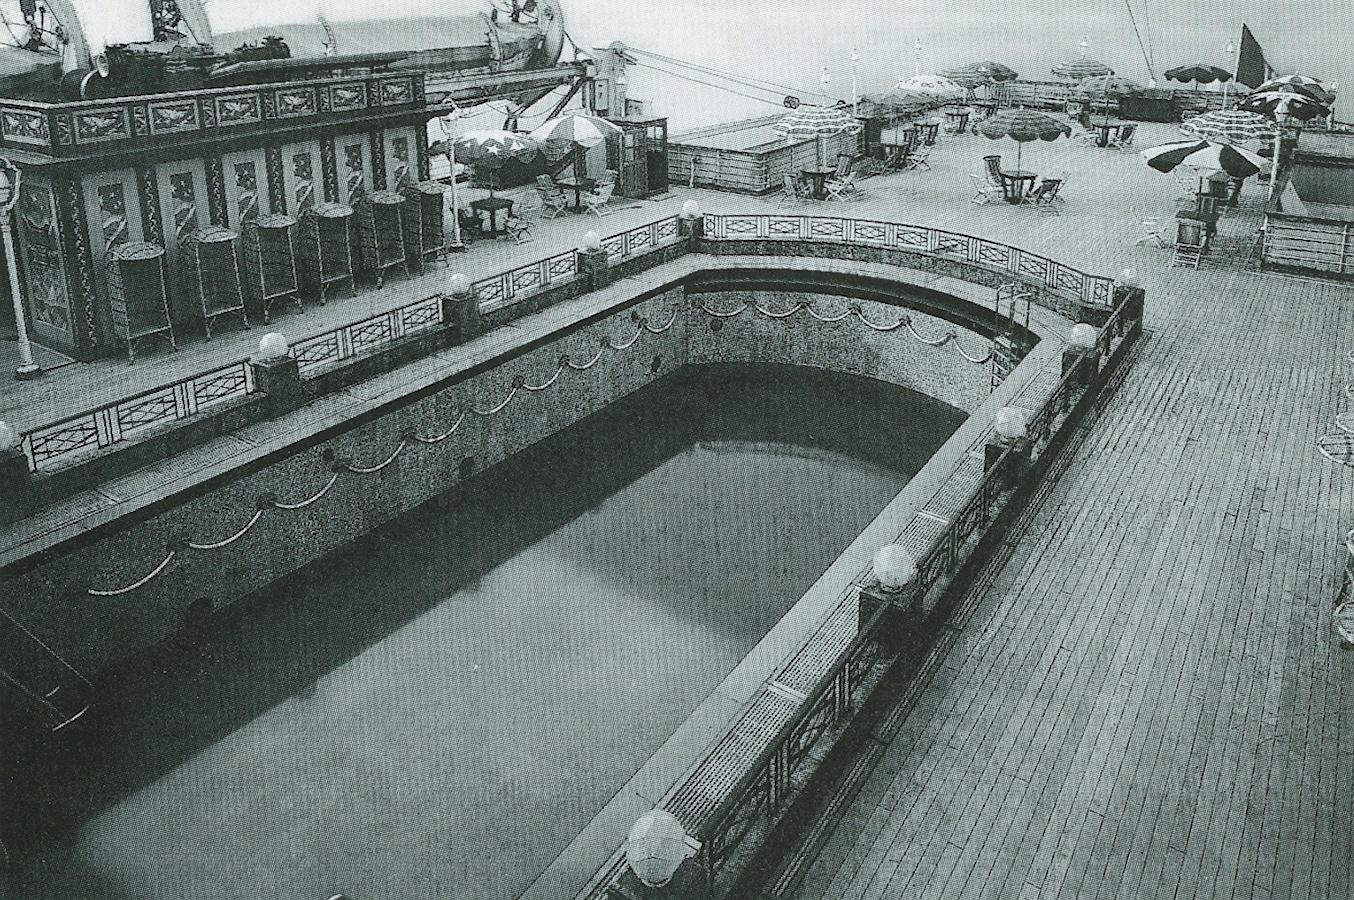 Transatlantico Rex, la grande piscina scoperta, fine anni Trenta